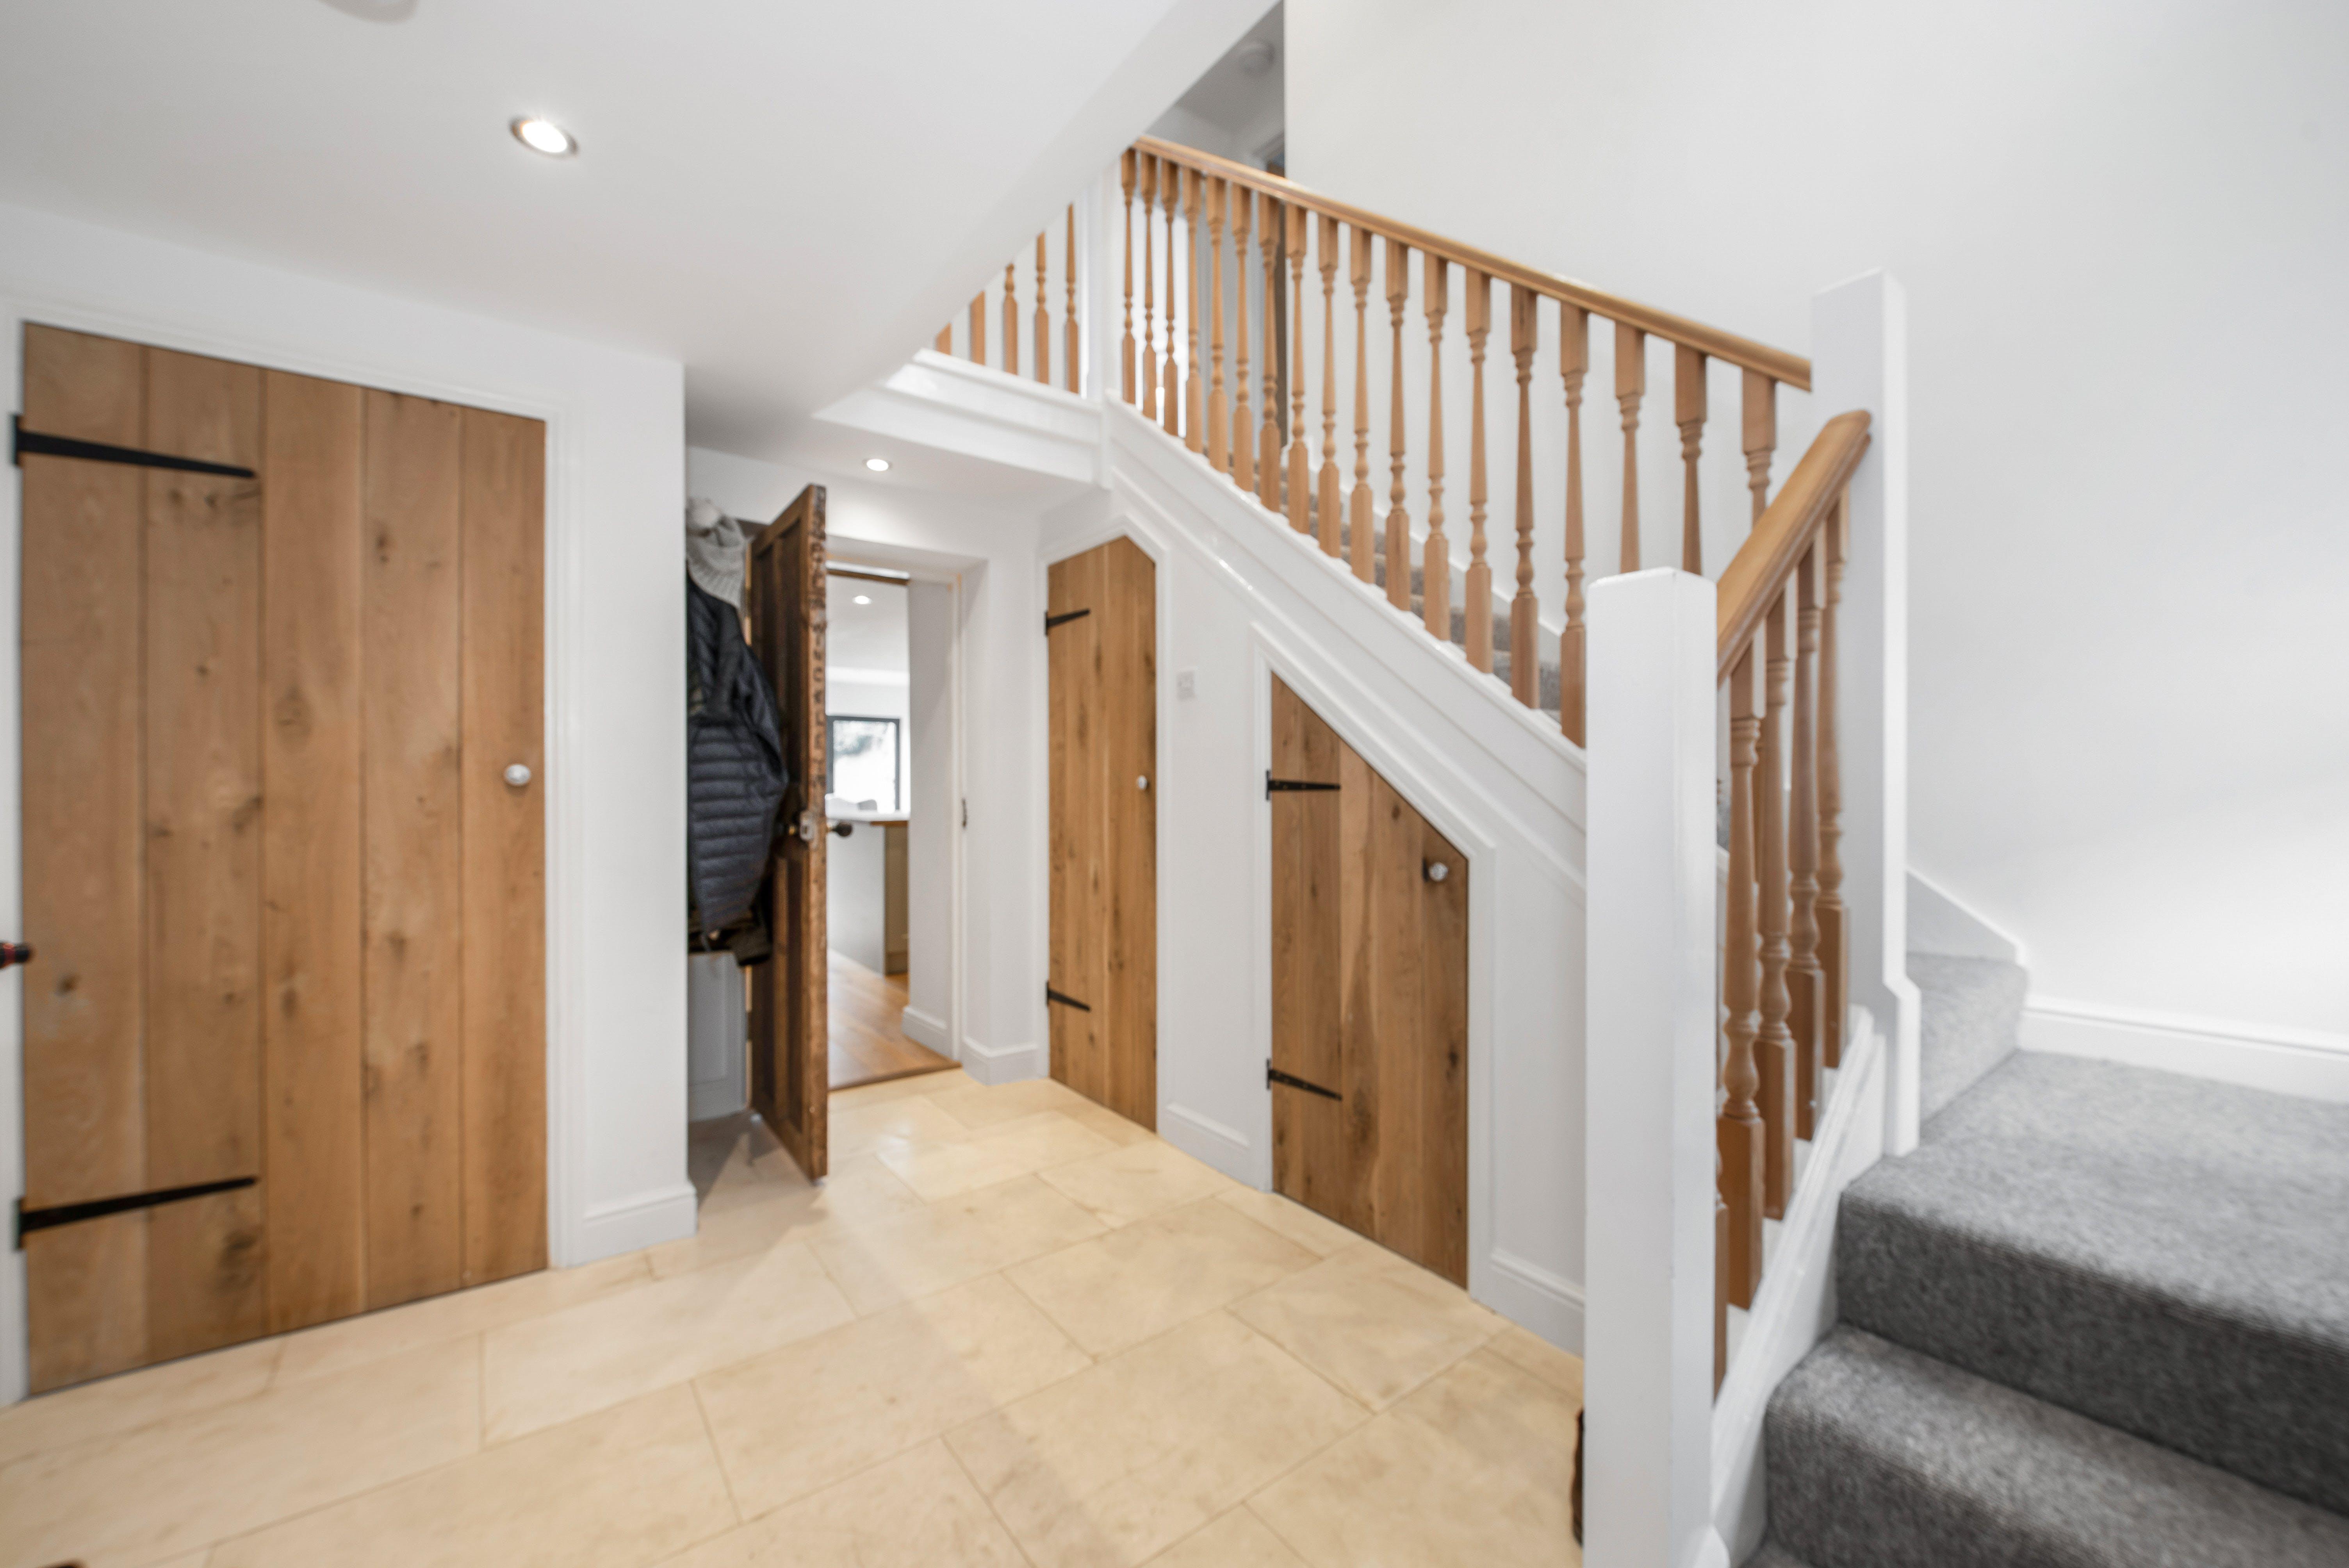 31 Windmill Street, Aylesbury, Residential For Sale - 31 Windmill Street15.jpg